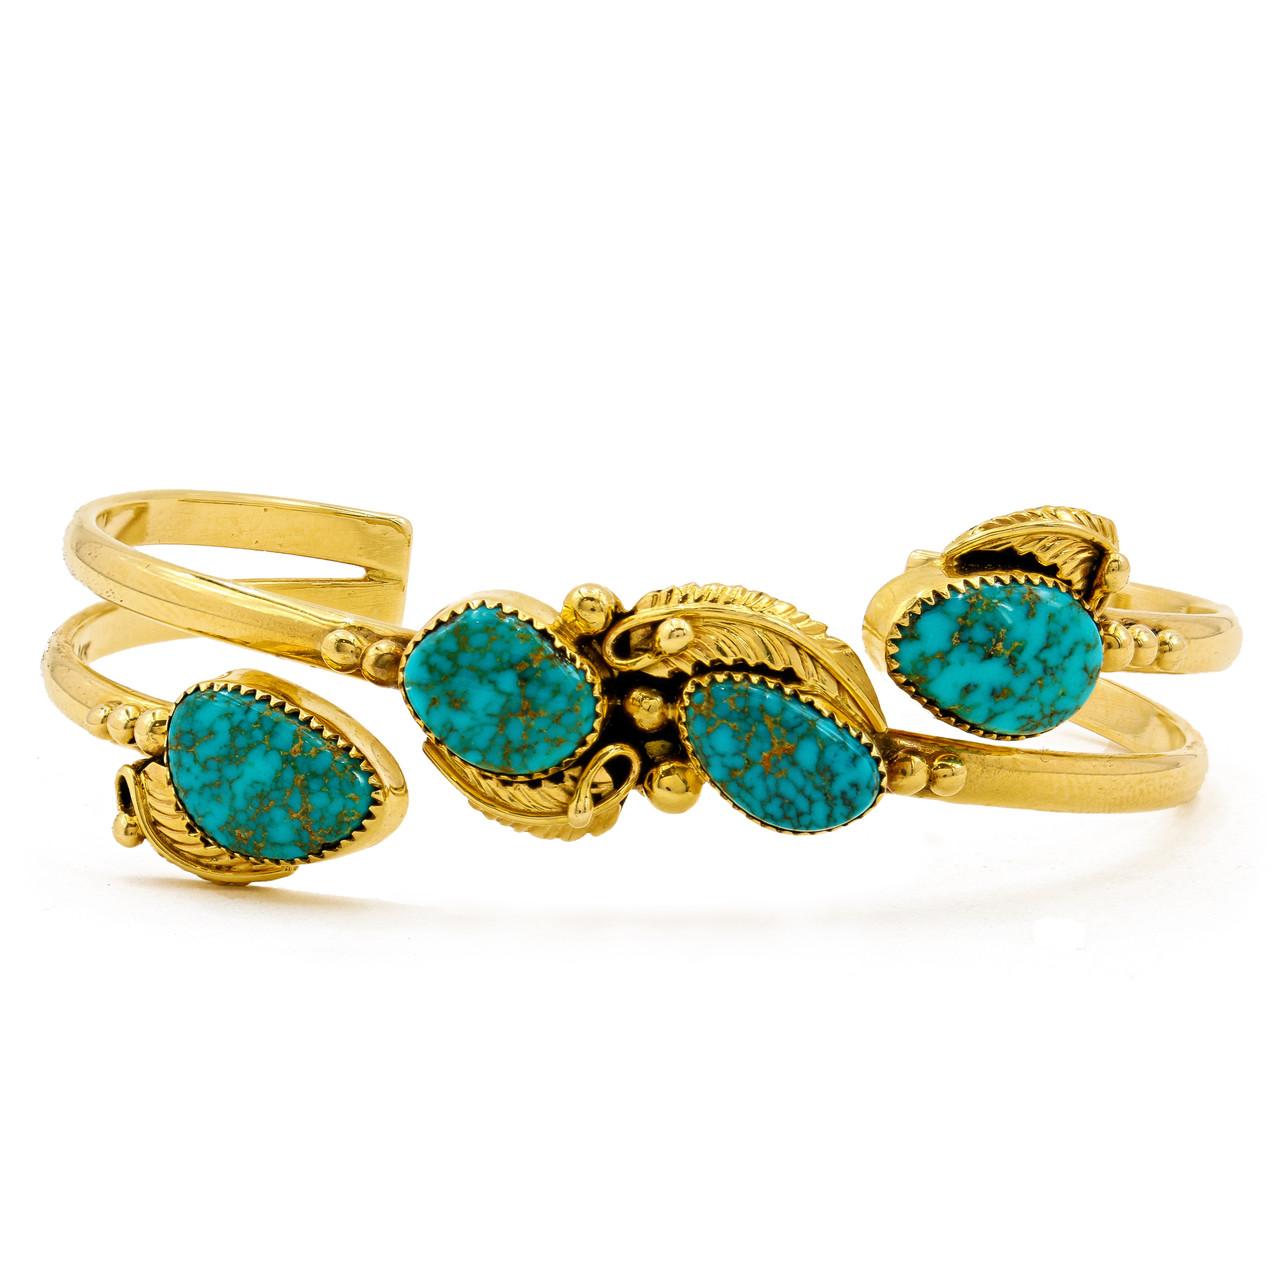 Turquoise Bracelet Gold Gemstone Turquoise Bangle Bangle Bracelet Adjustable Bangle Birthstone Bracelet Gold Jewelry Gold Cuff Bangle